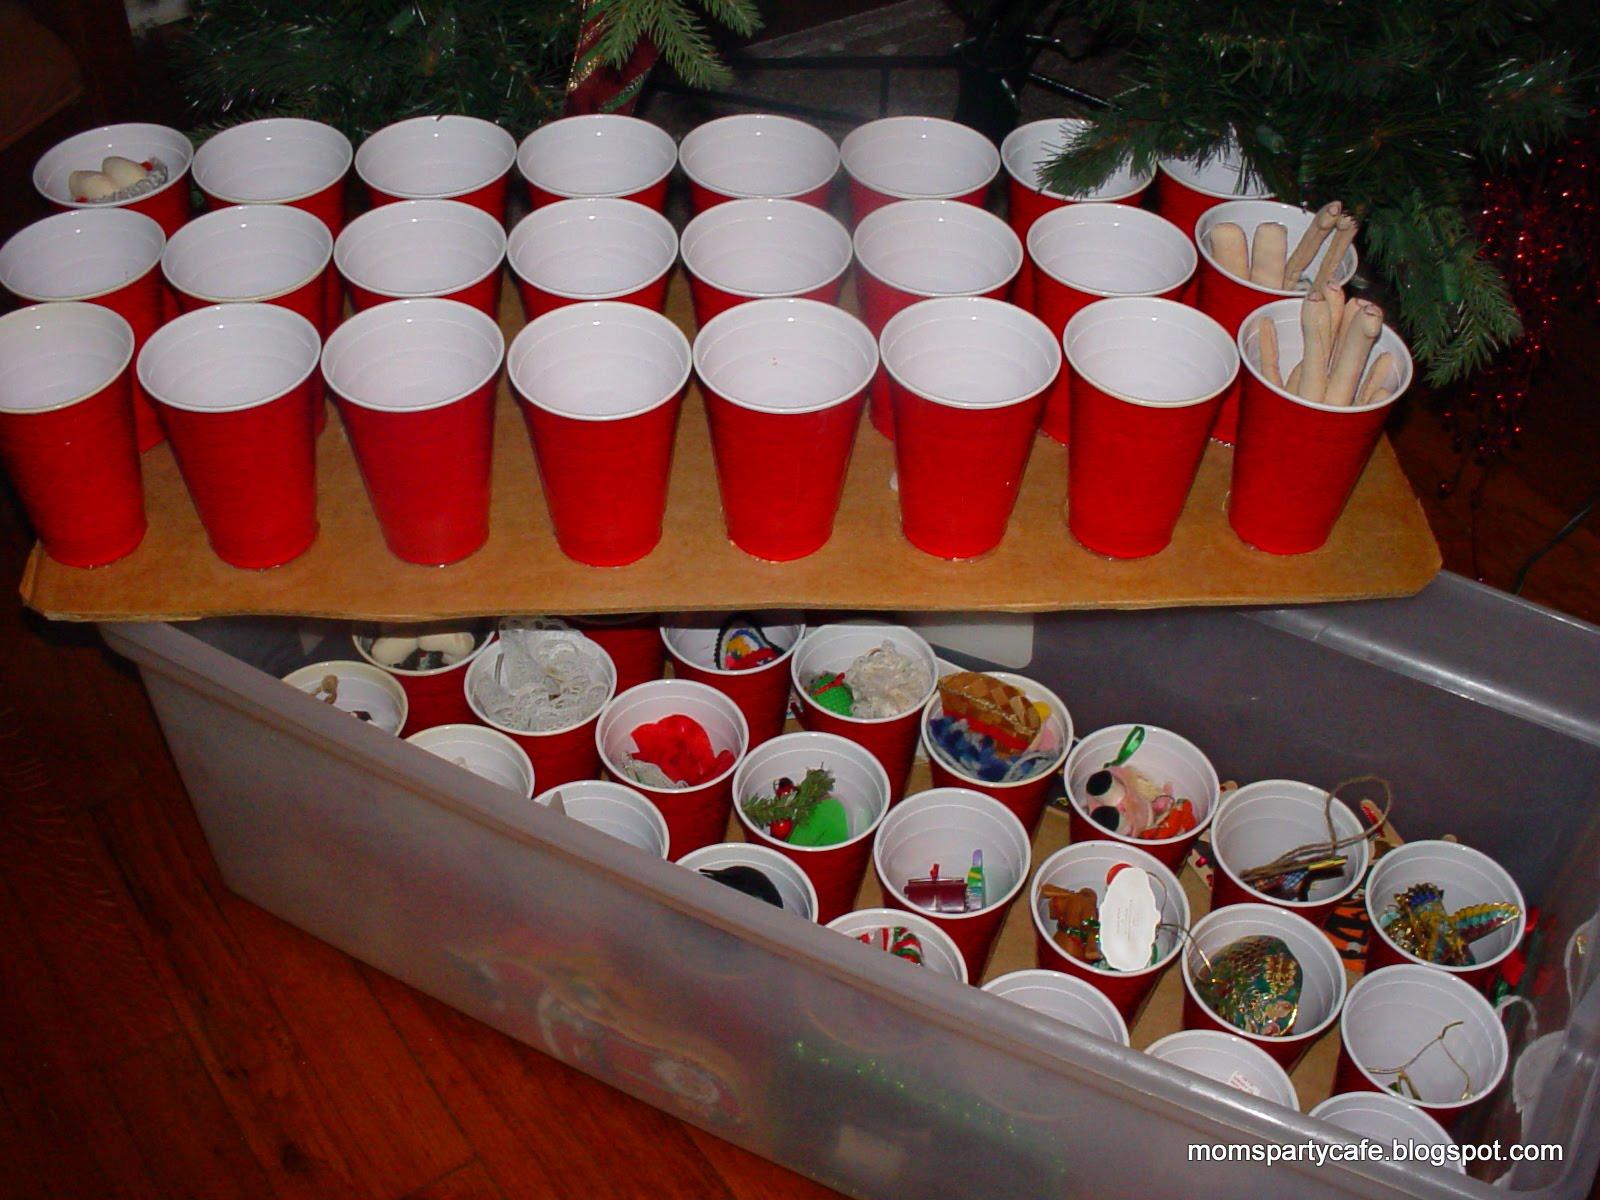 Moms' Party Café: Savvy Tip: Putting Christmas Away